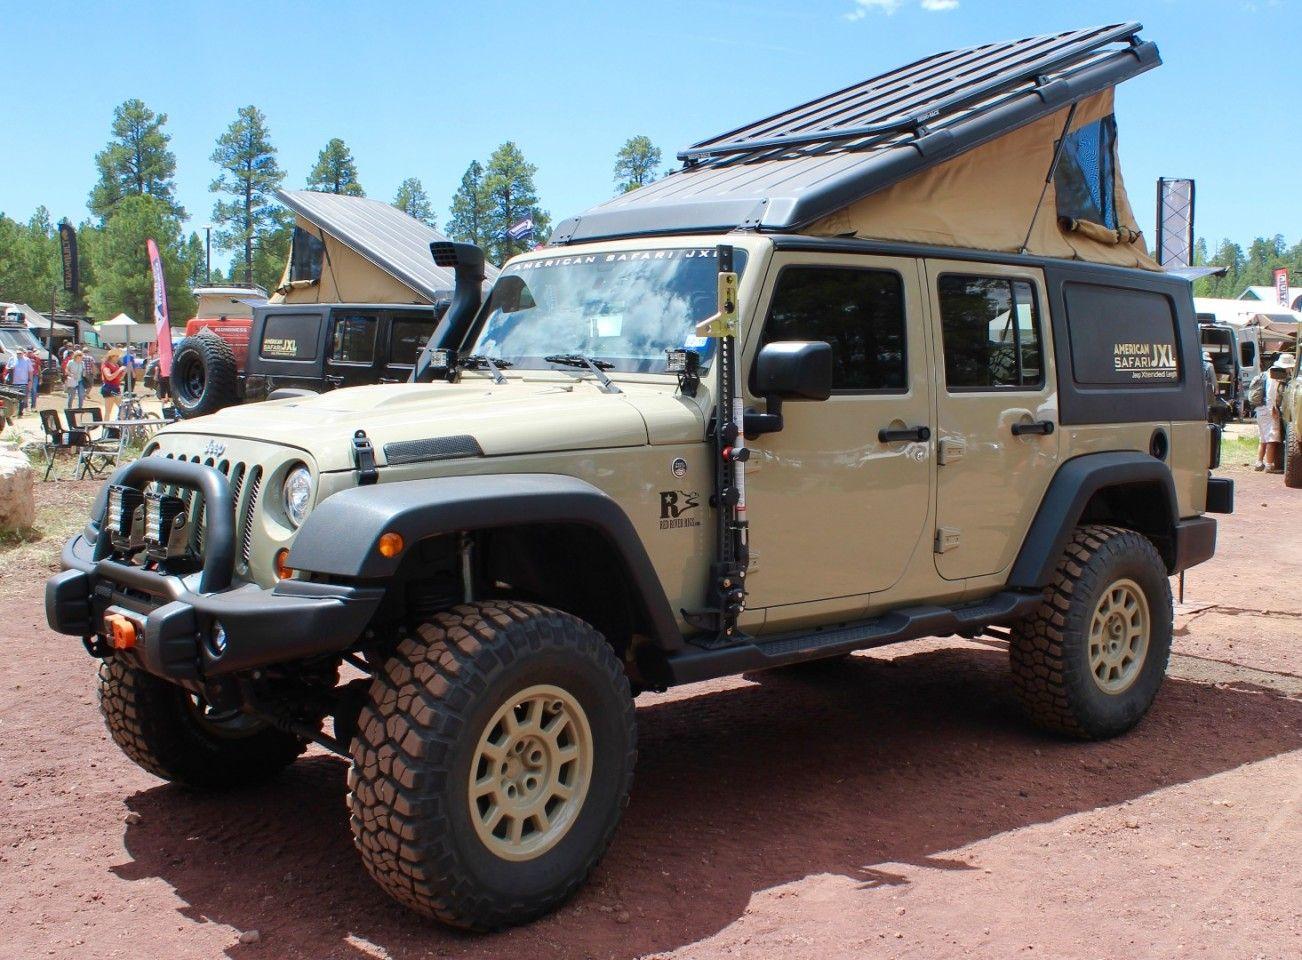 In photos Pickup campers, big rig motorhomes and